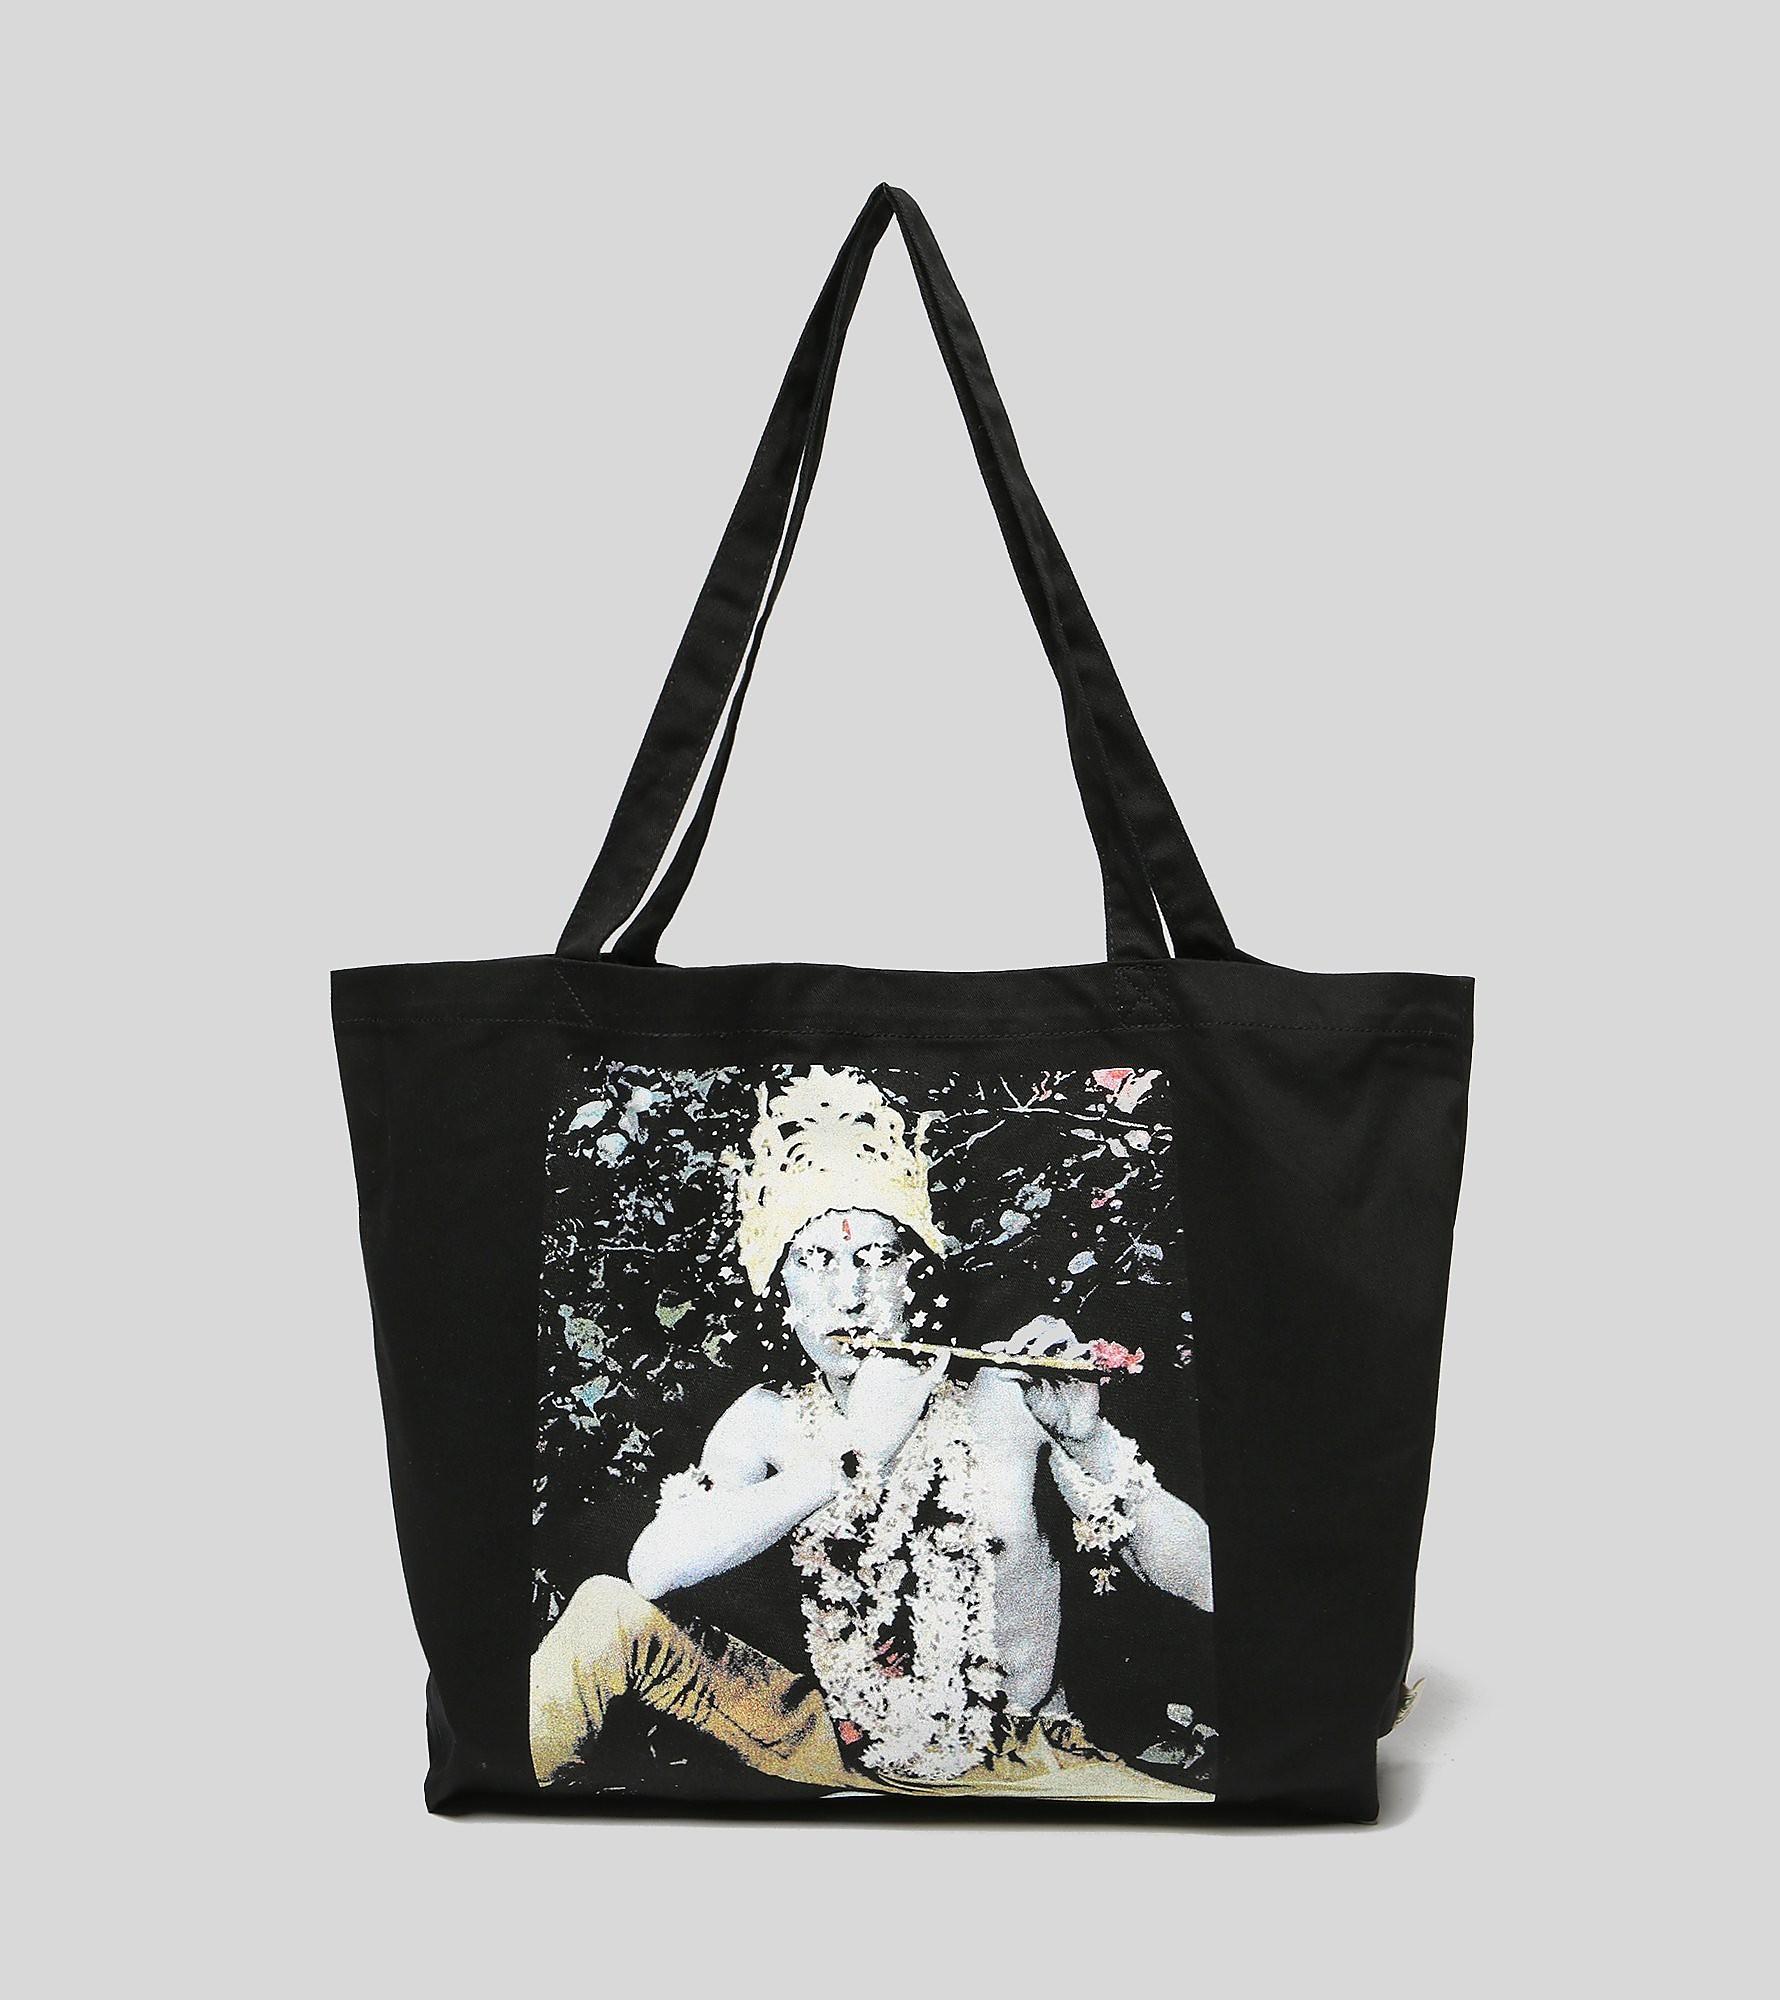 PRMTVO Tote Bag Seeing Stars